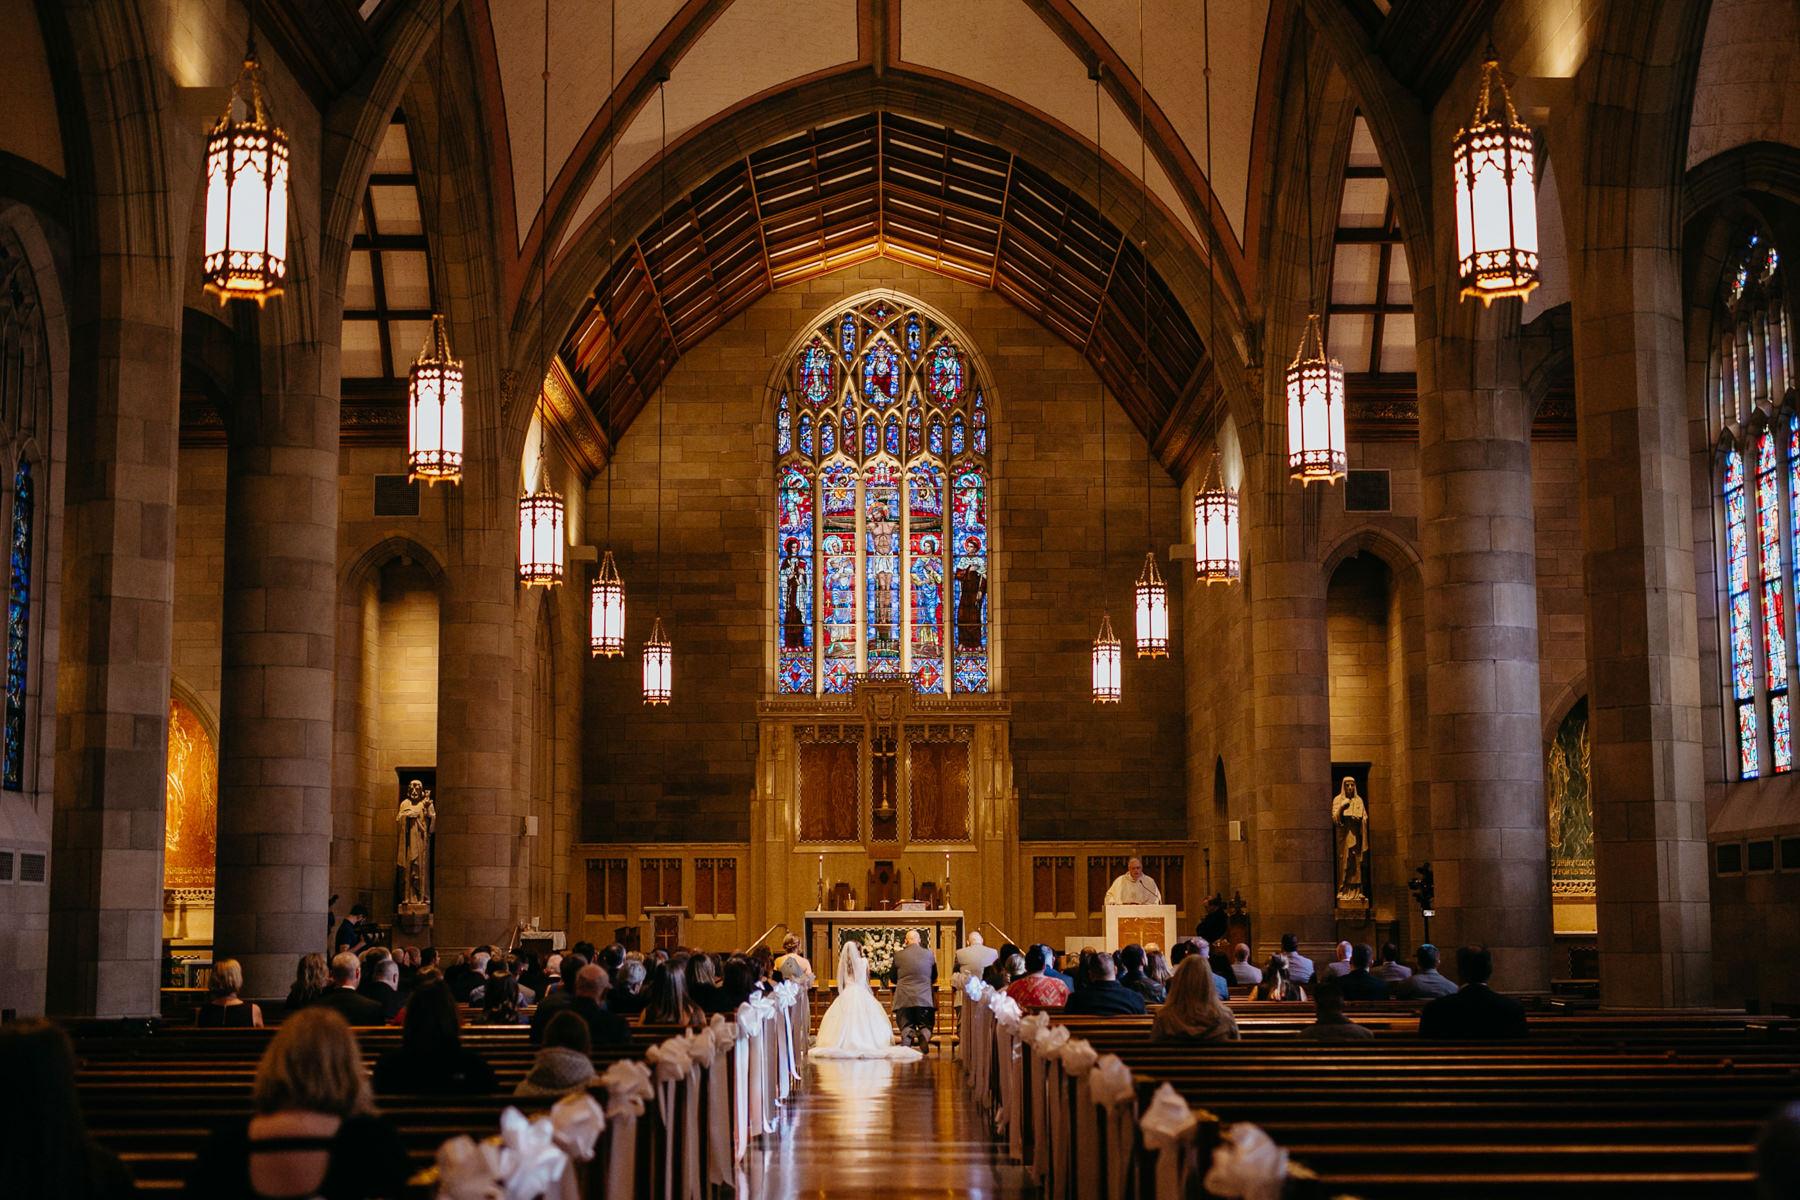 Quincy Ma Massachusetts Wedding Dedham Boston Granie Links Wedding New England Catholic Cathedral Liz Osban Photography 45.jpg